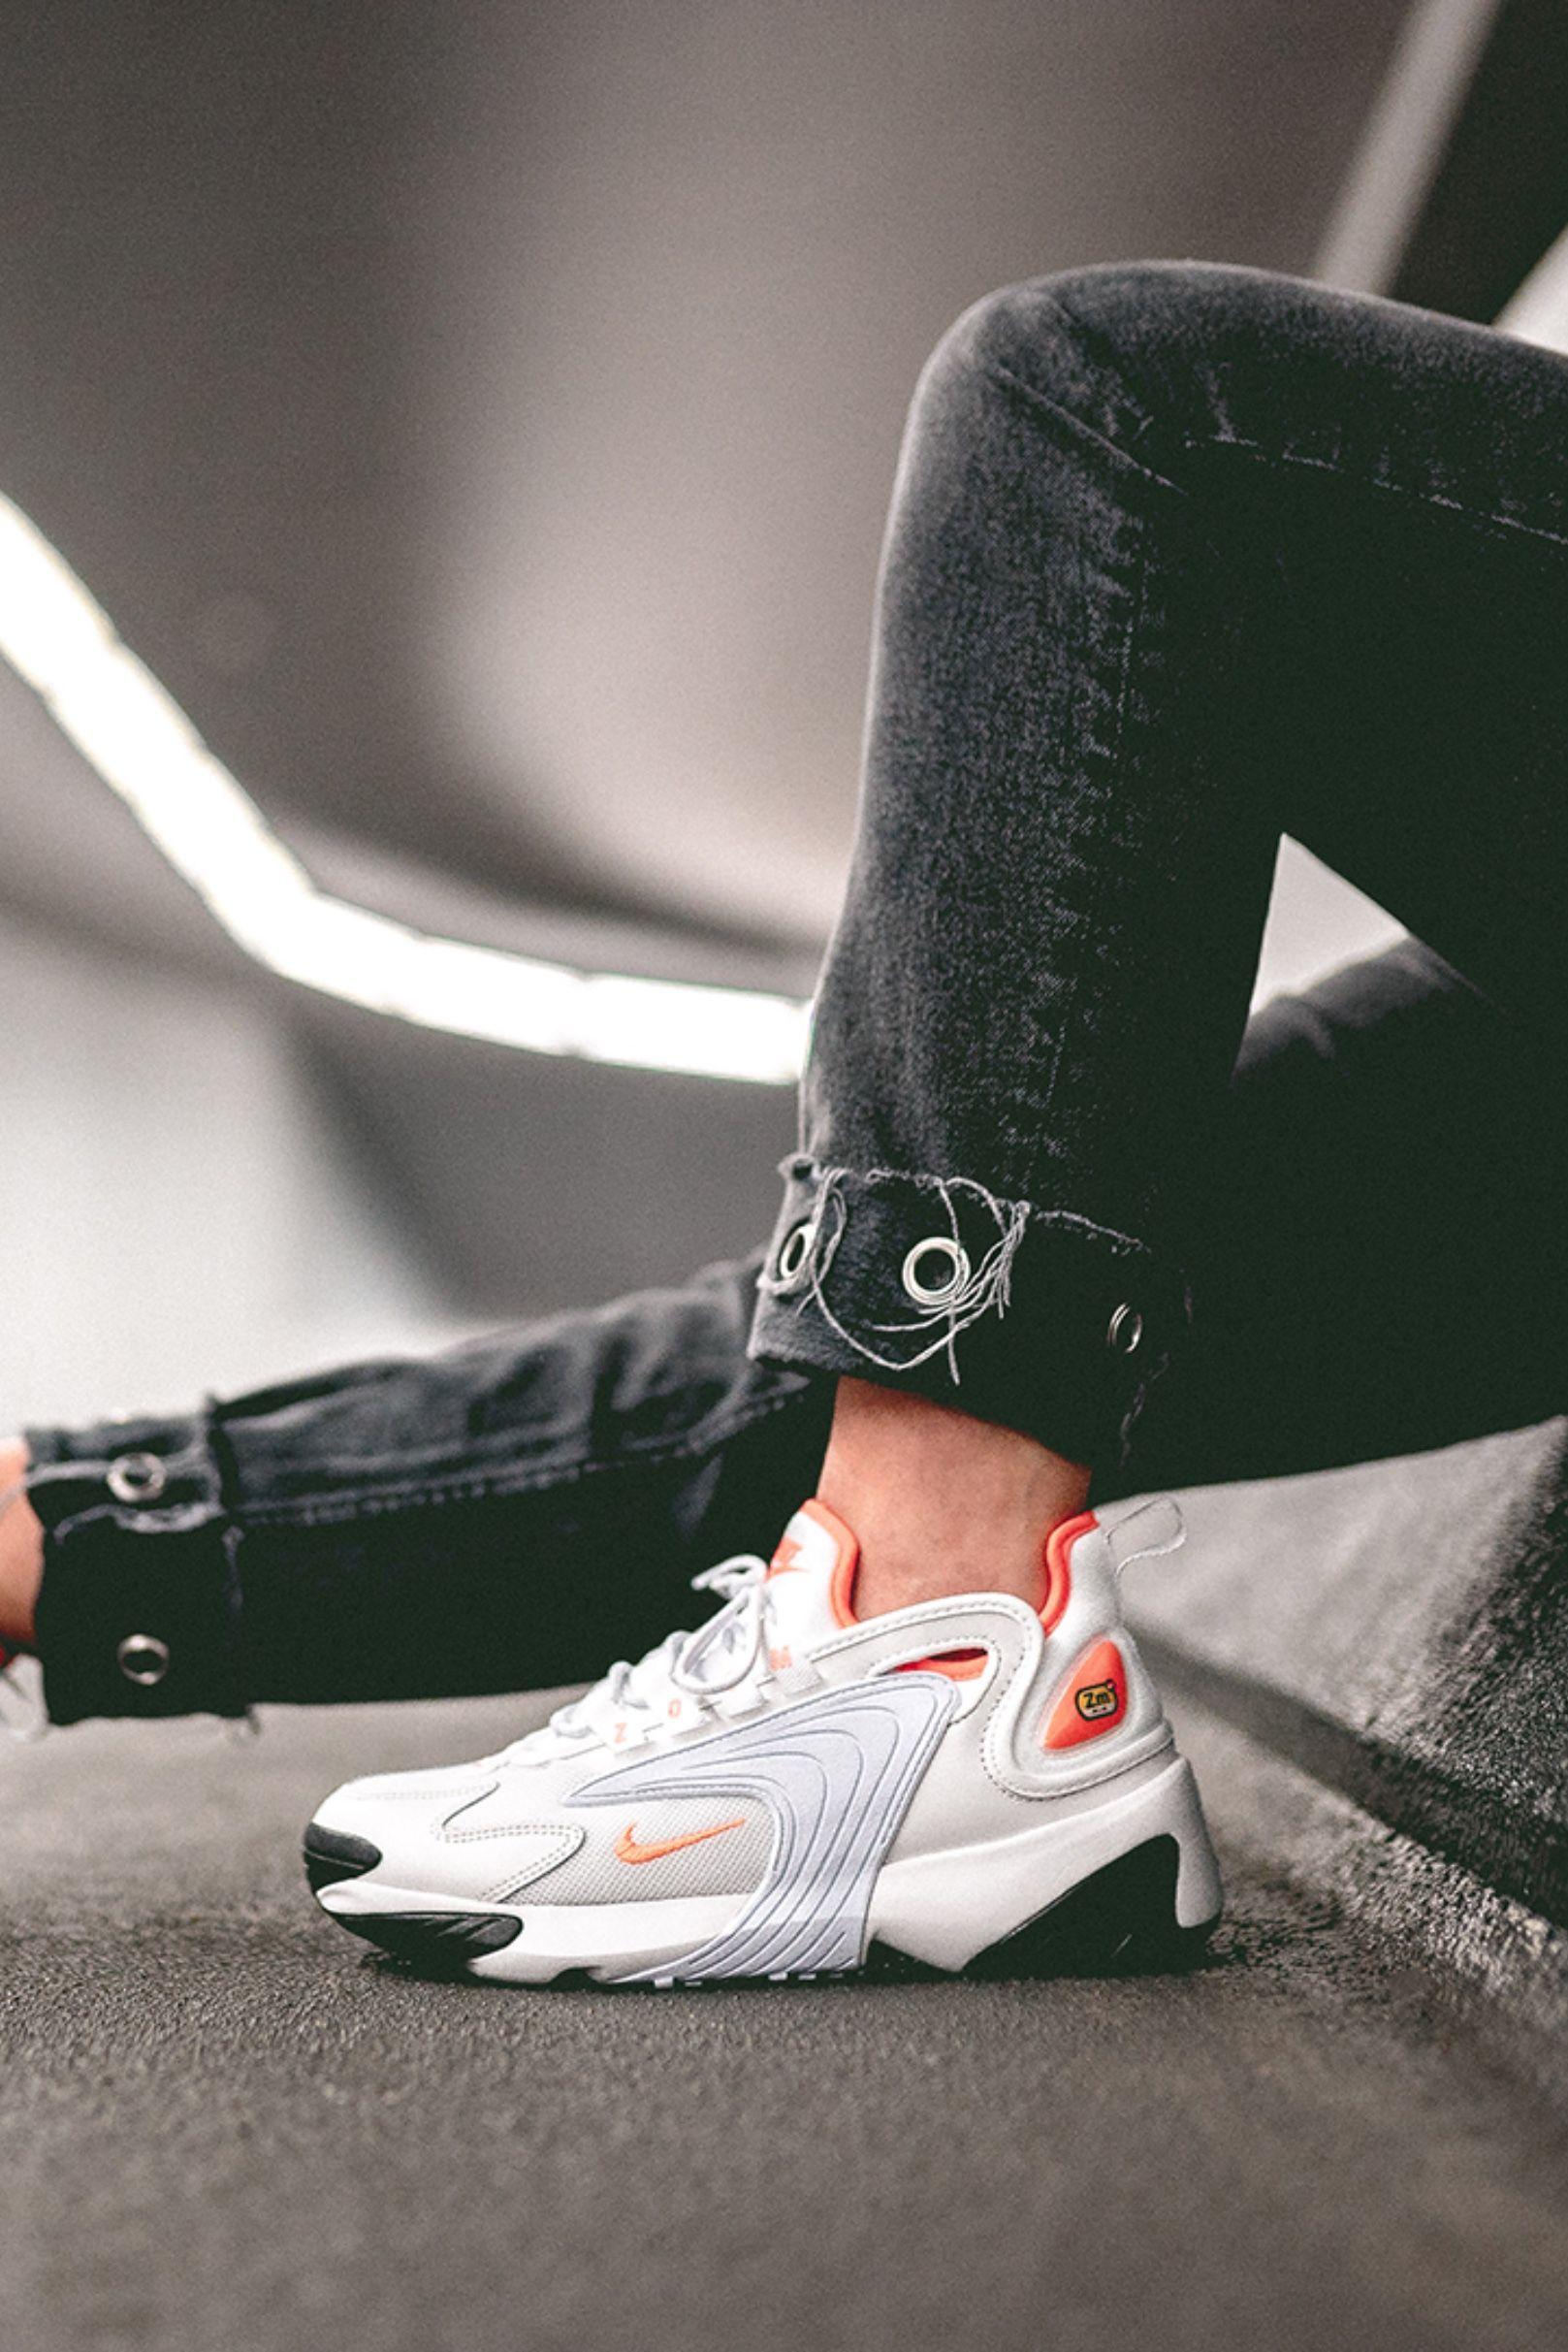 Nike Introduces the Zoom 2K Model | Nike zoom, Nike, Nike women